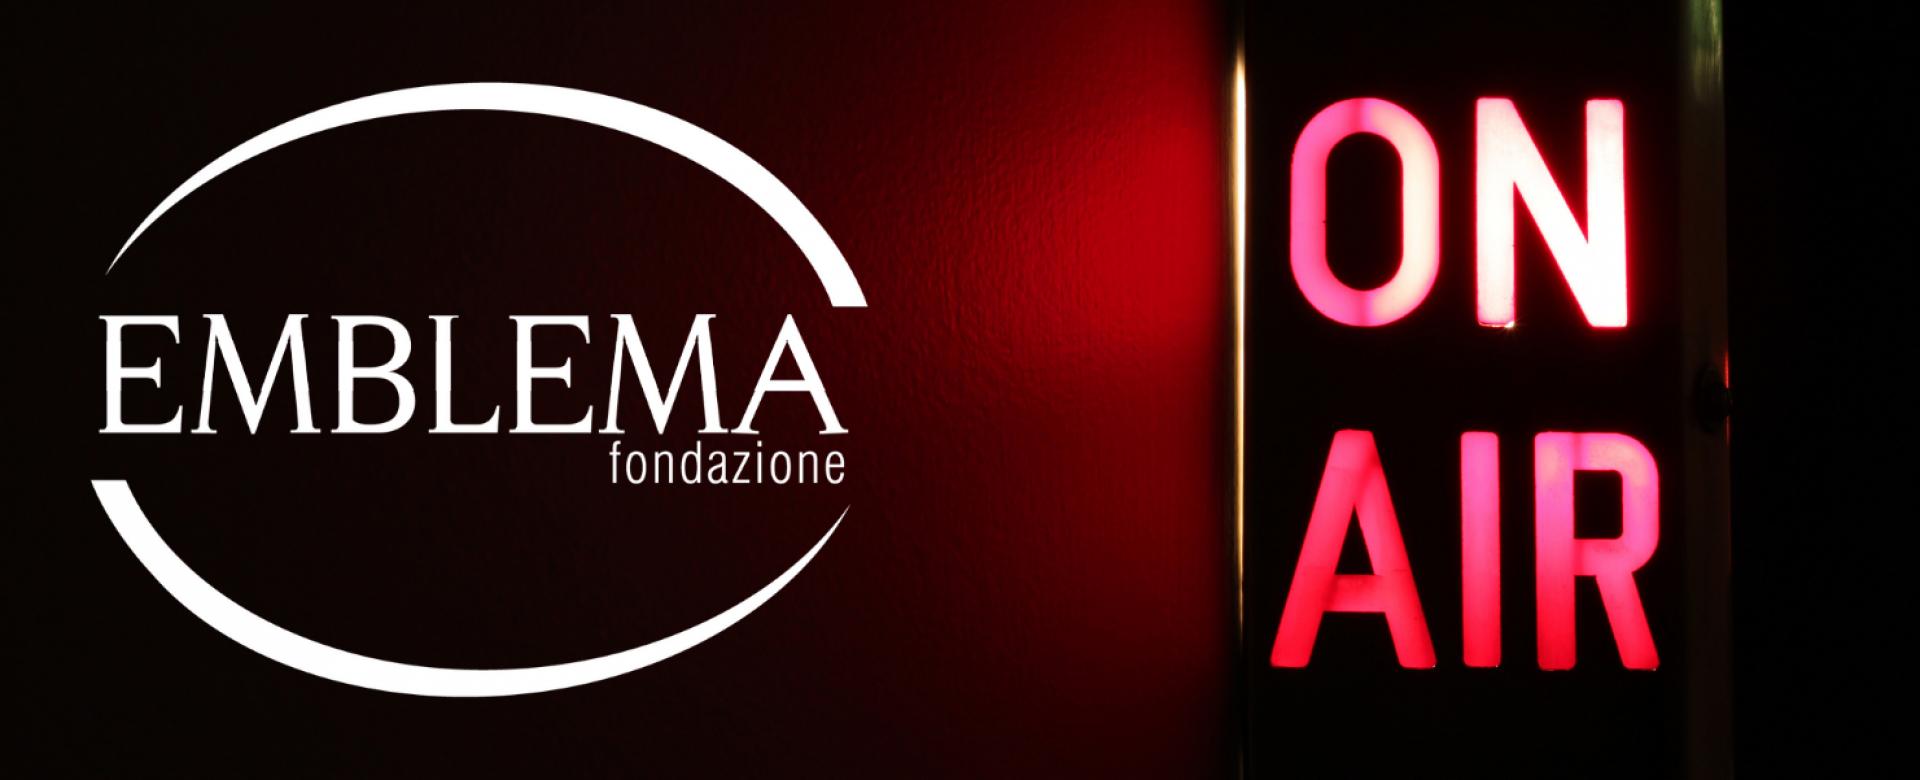 23.06.2020 - Fondazione Emblema: on air!